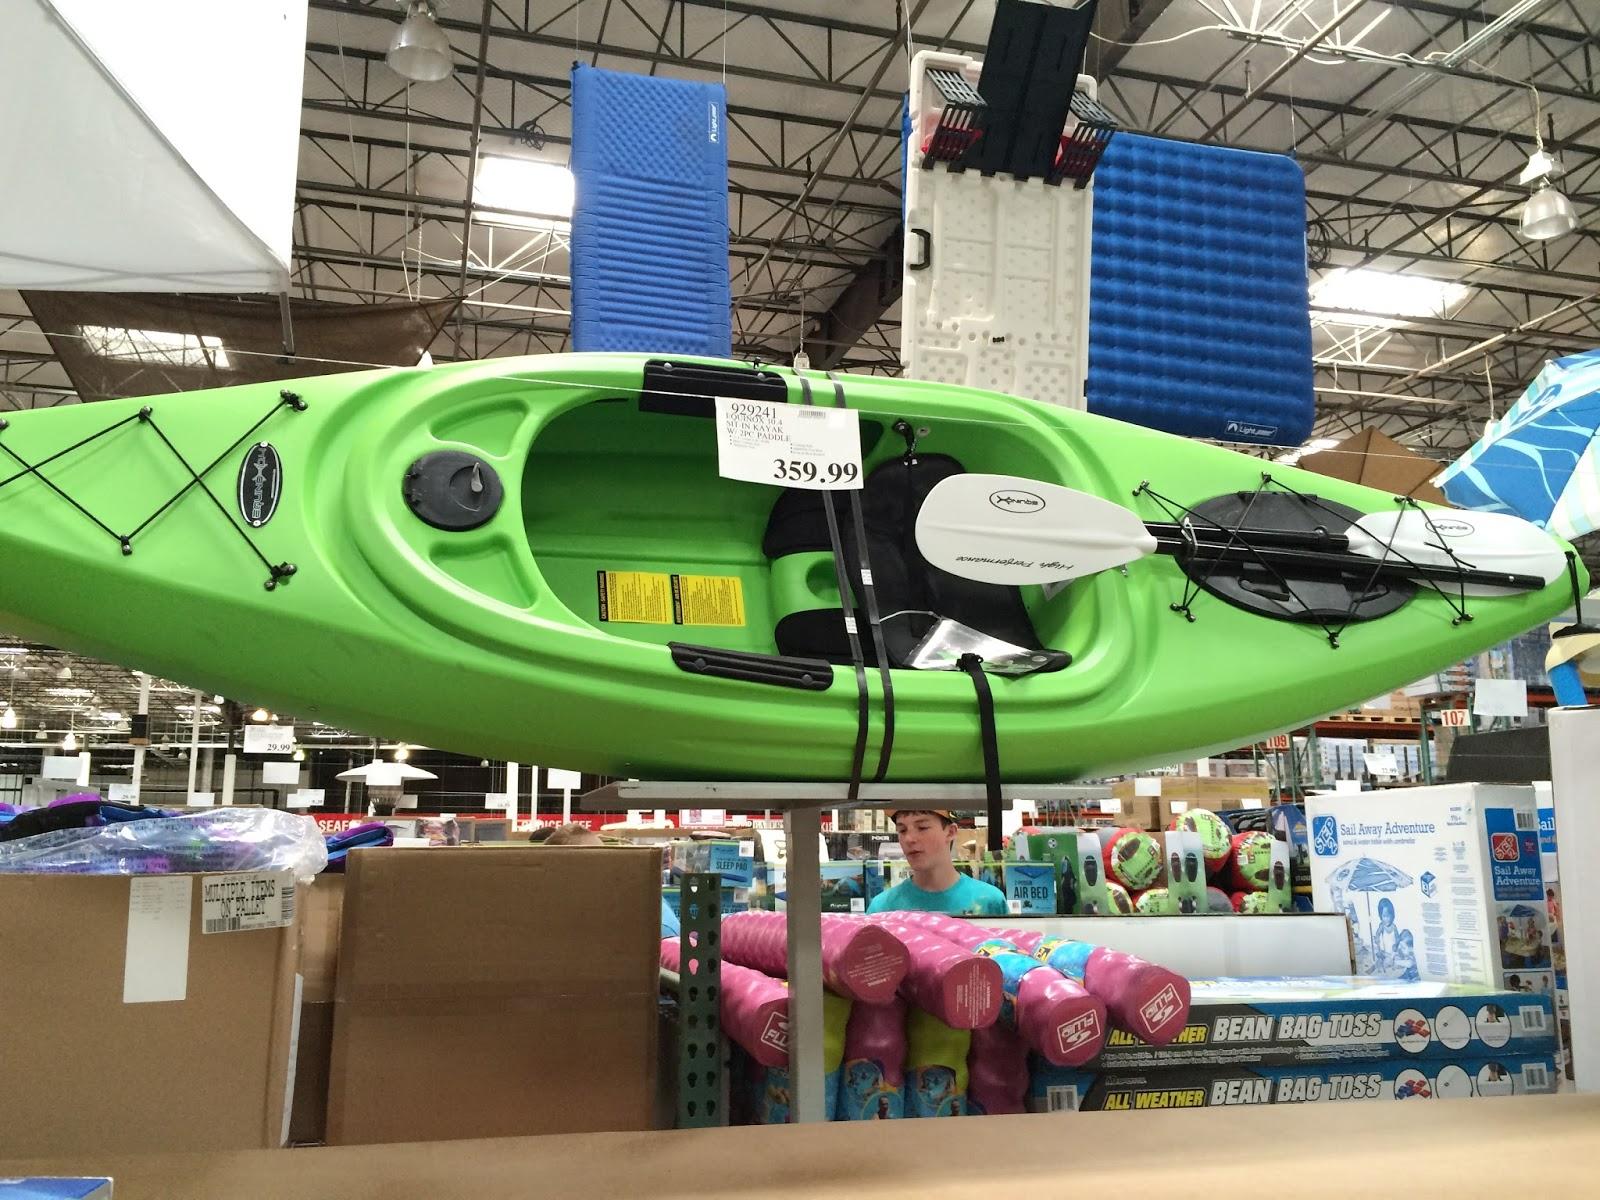 Equinox 10 4 Sit-in Kayak with 2 piece paddle | Costco Weekender